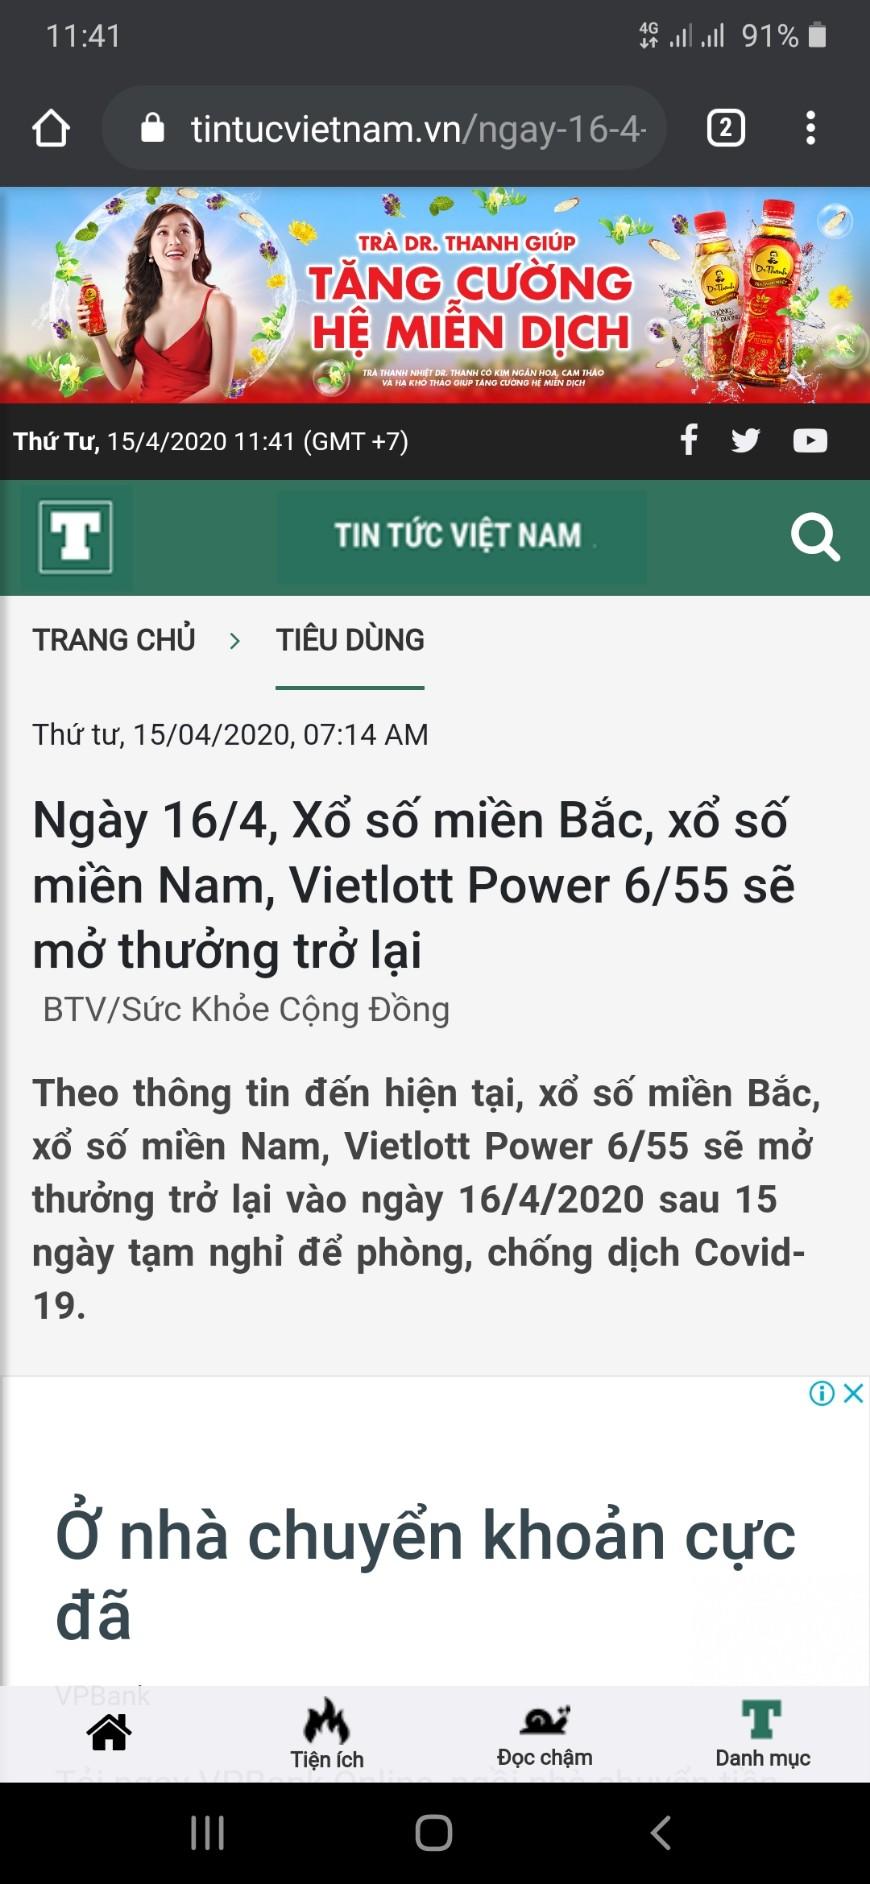 6C233349-09EC-4CD8-87D0-C61DC2EE134B.jpeg